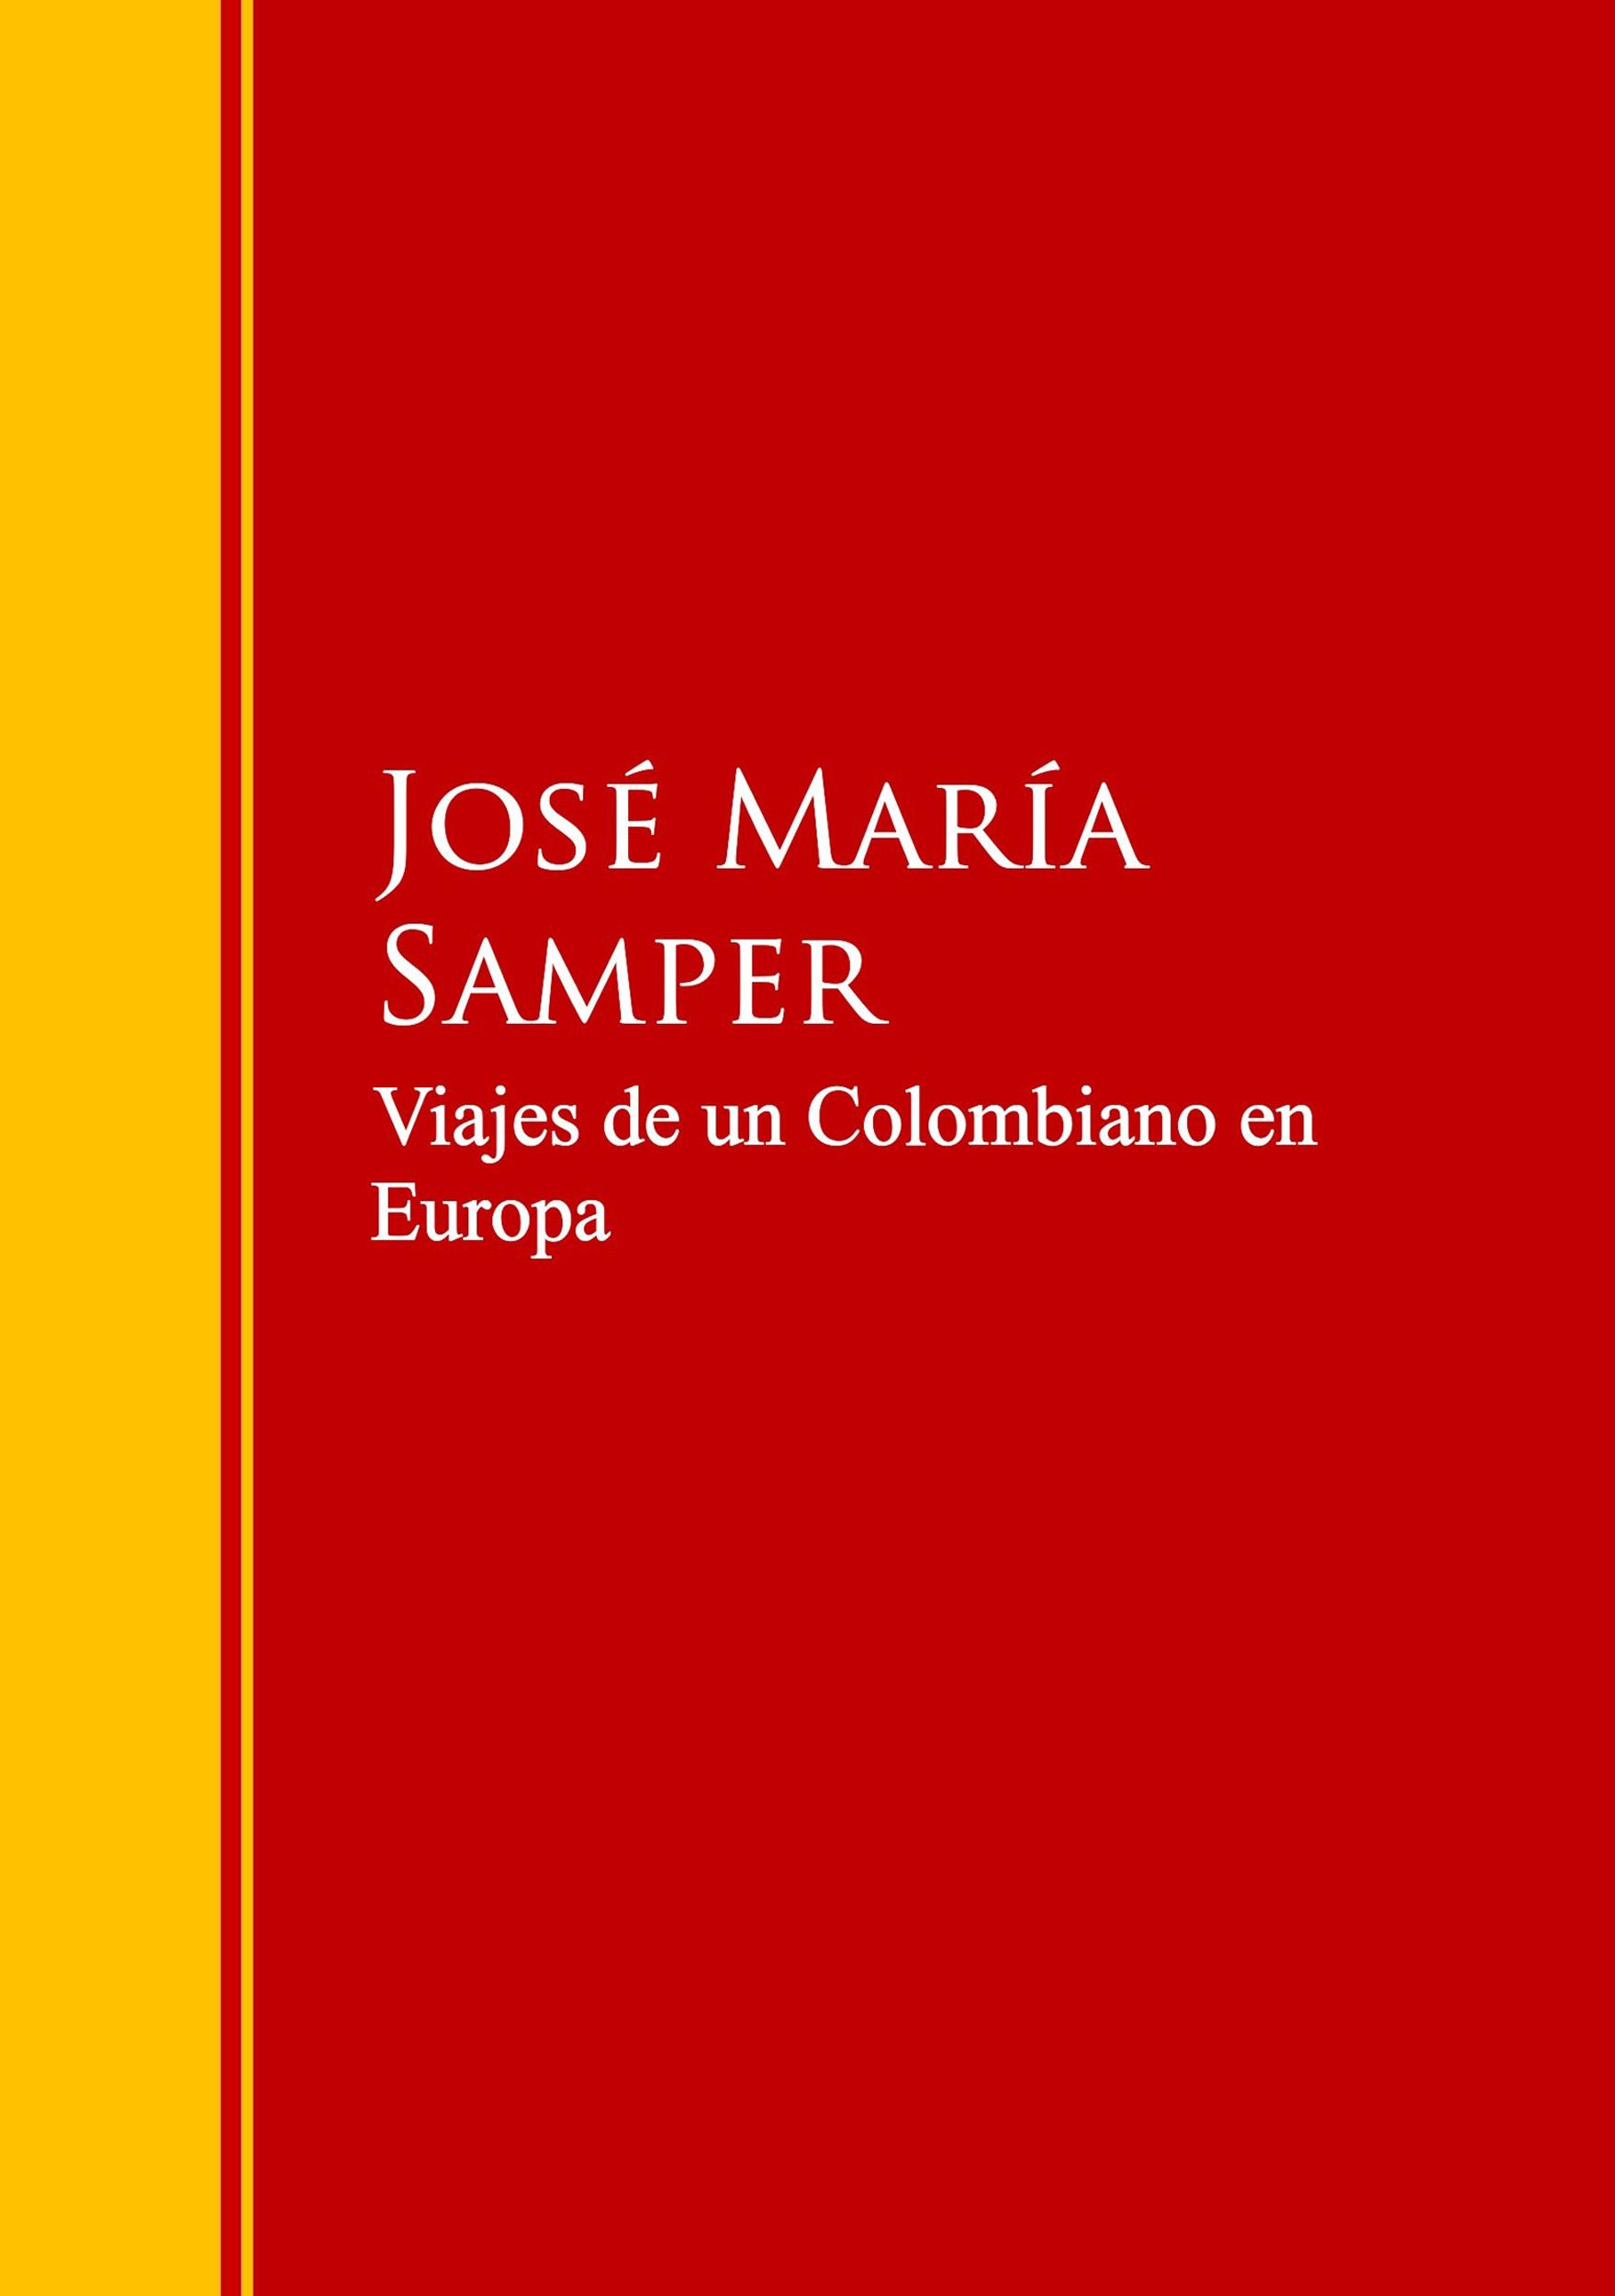 Jose Maria Samper Viajes de un Colombiano en Europa alzugaray pilar barrios maria jose bartolome paz preparacion dele b2 libro codigo